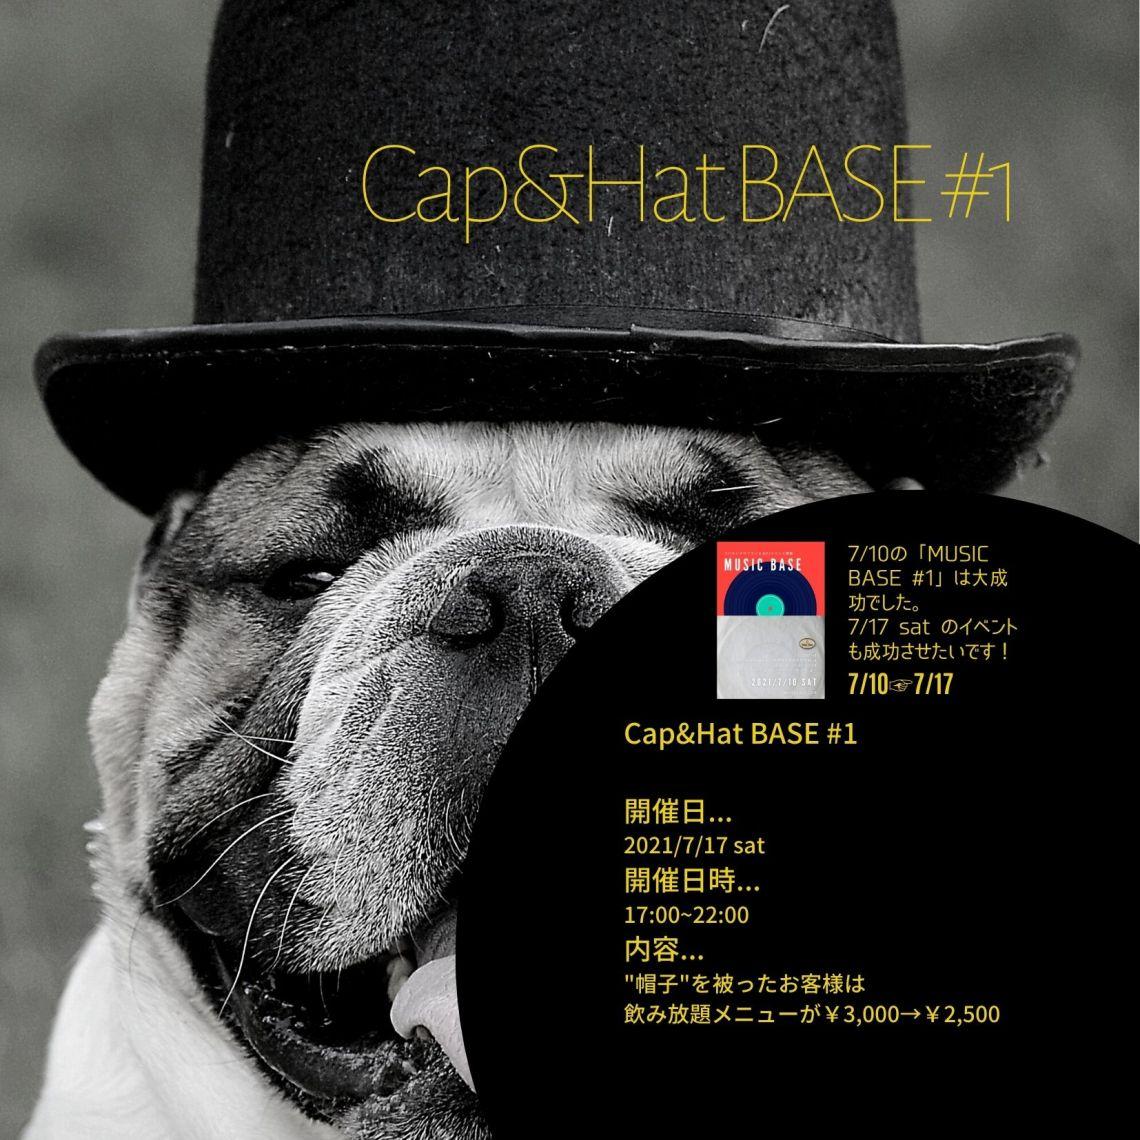 CapHatBASE#1